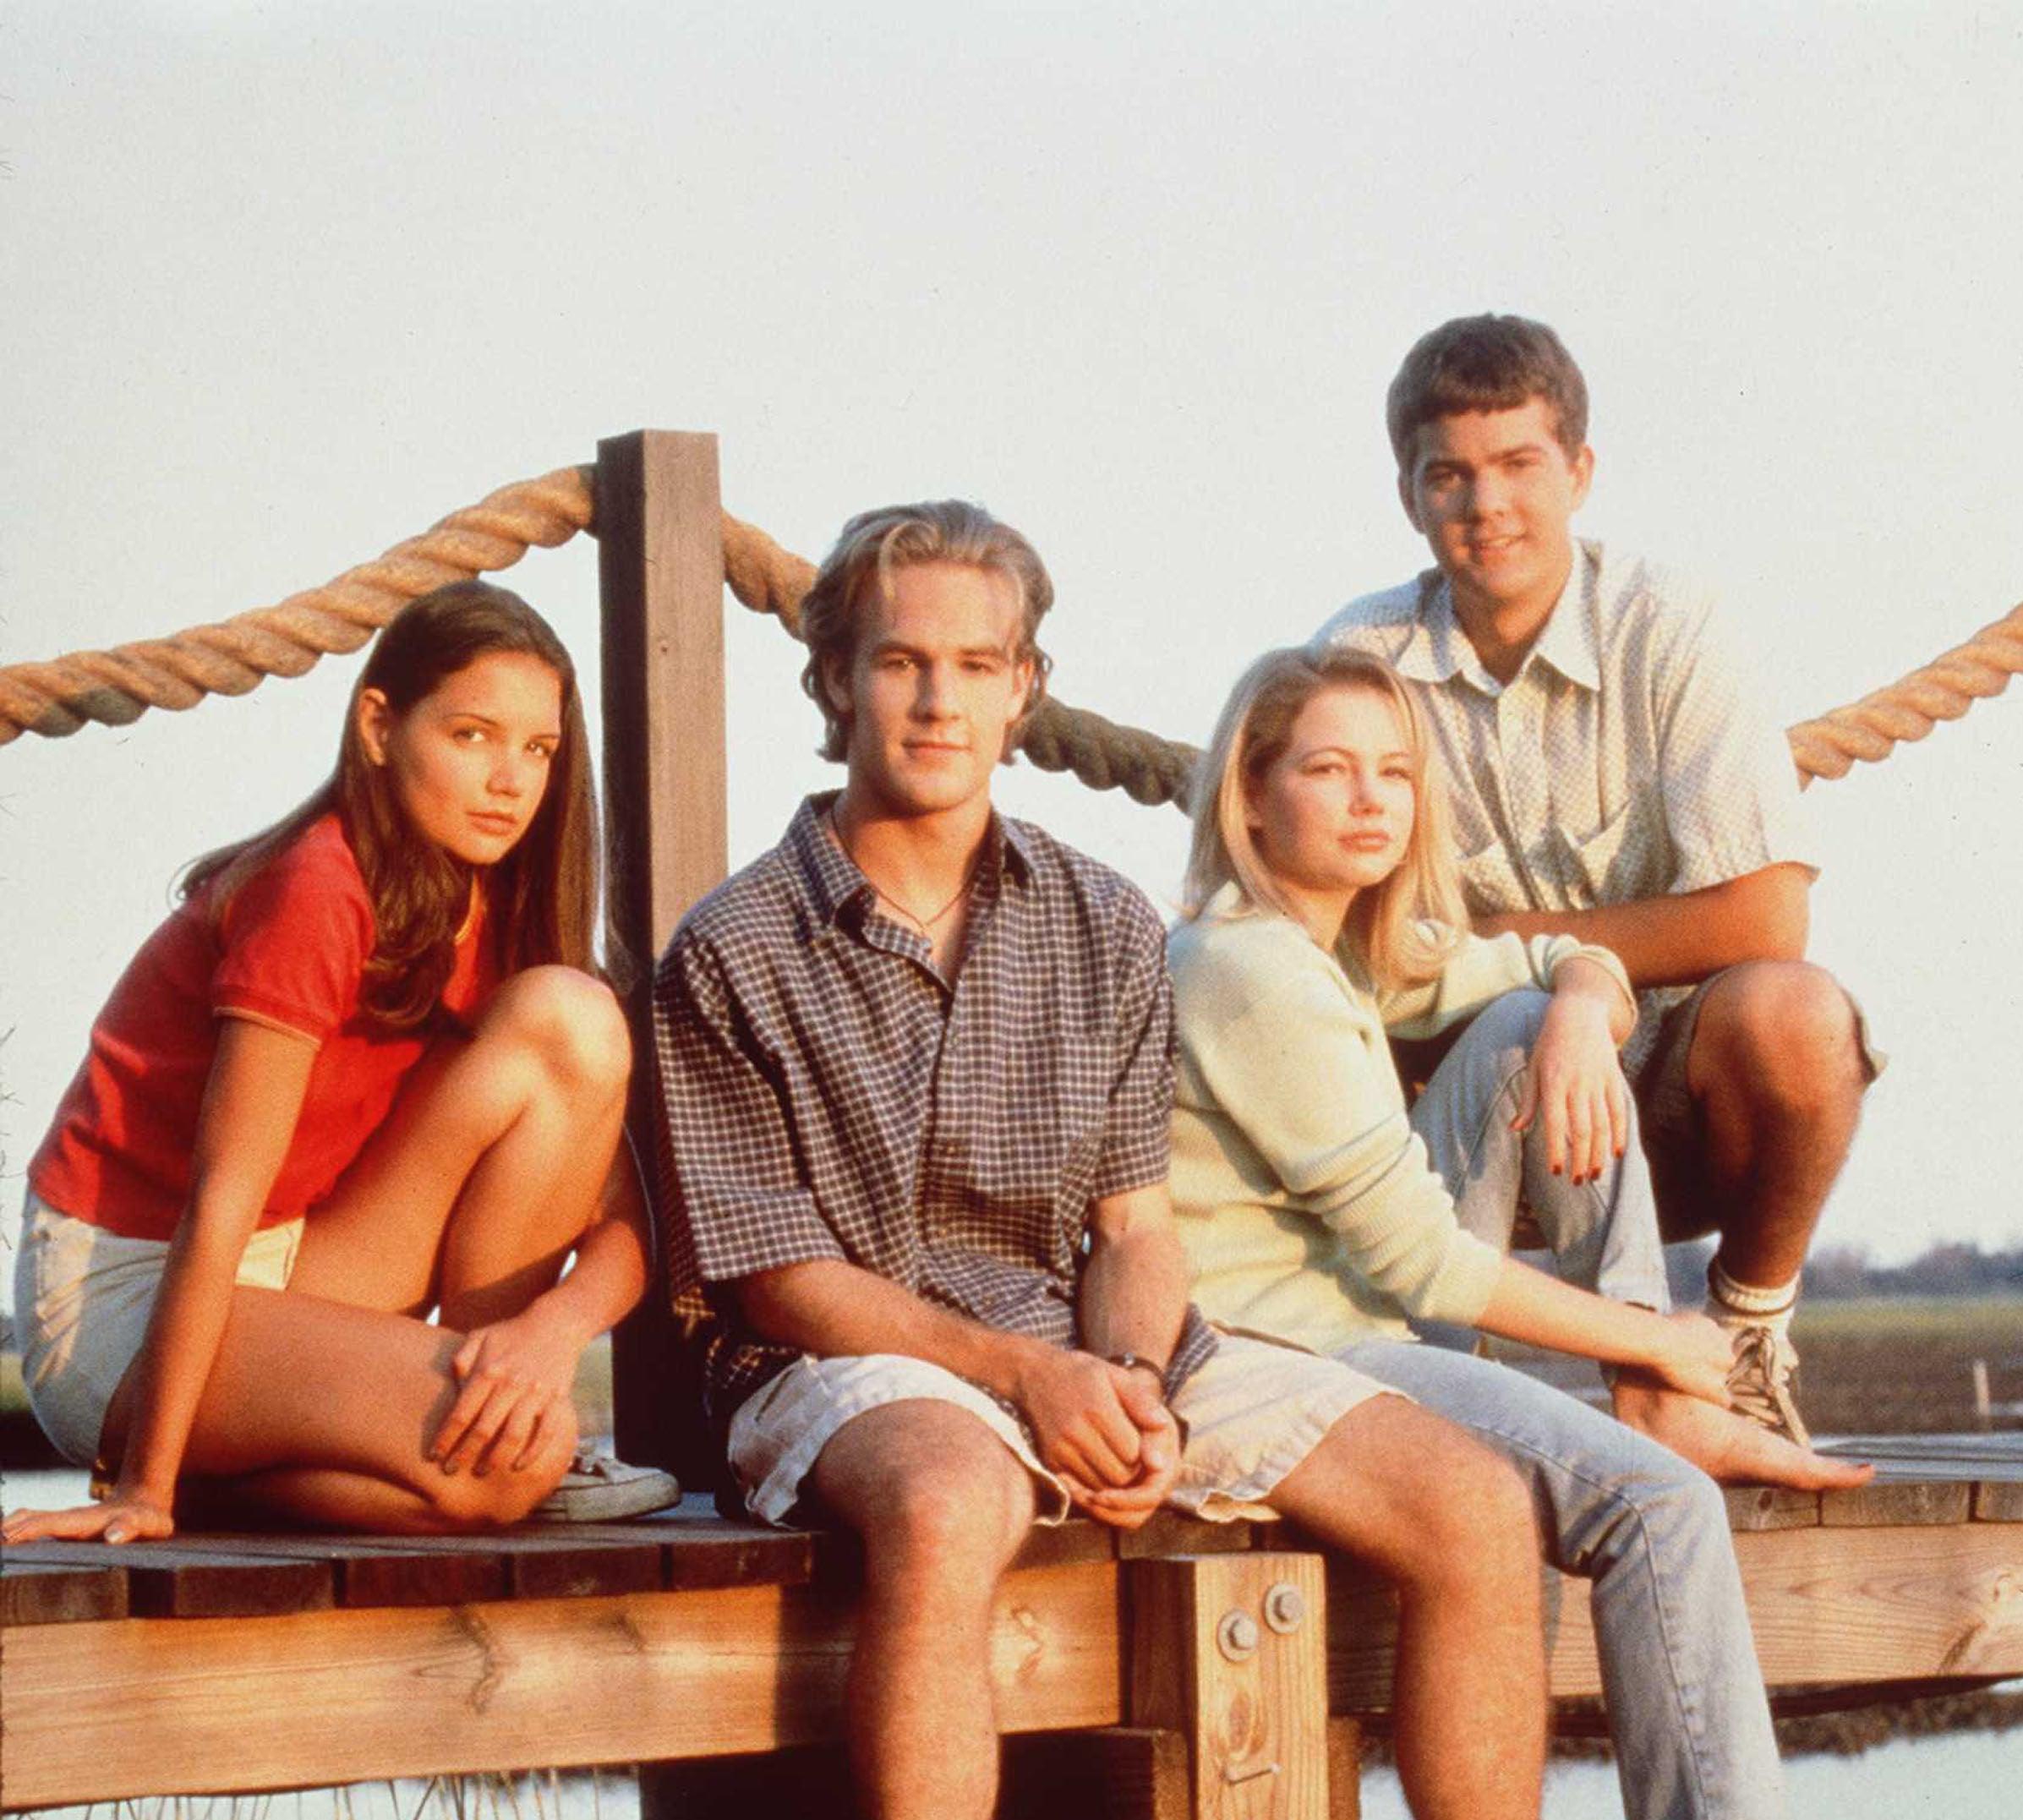 Season 1 Dawson's Creek cast photo